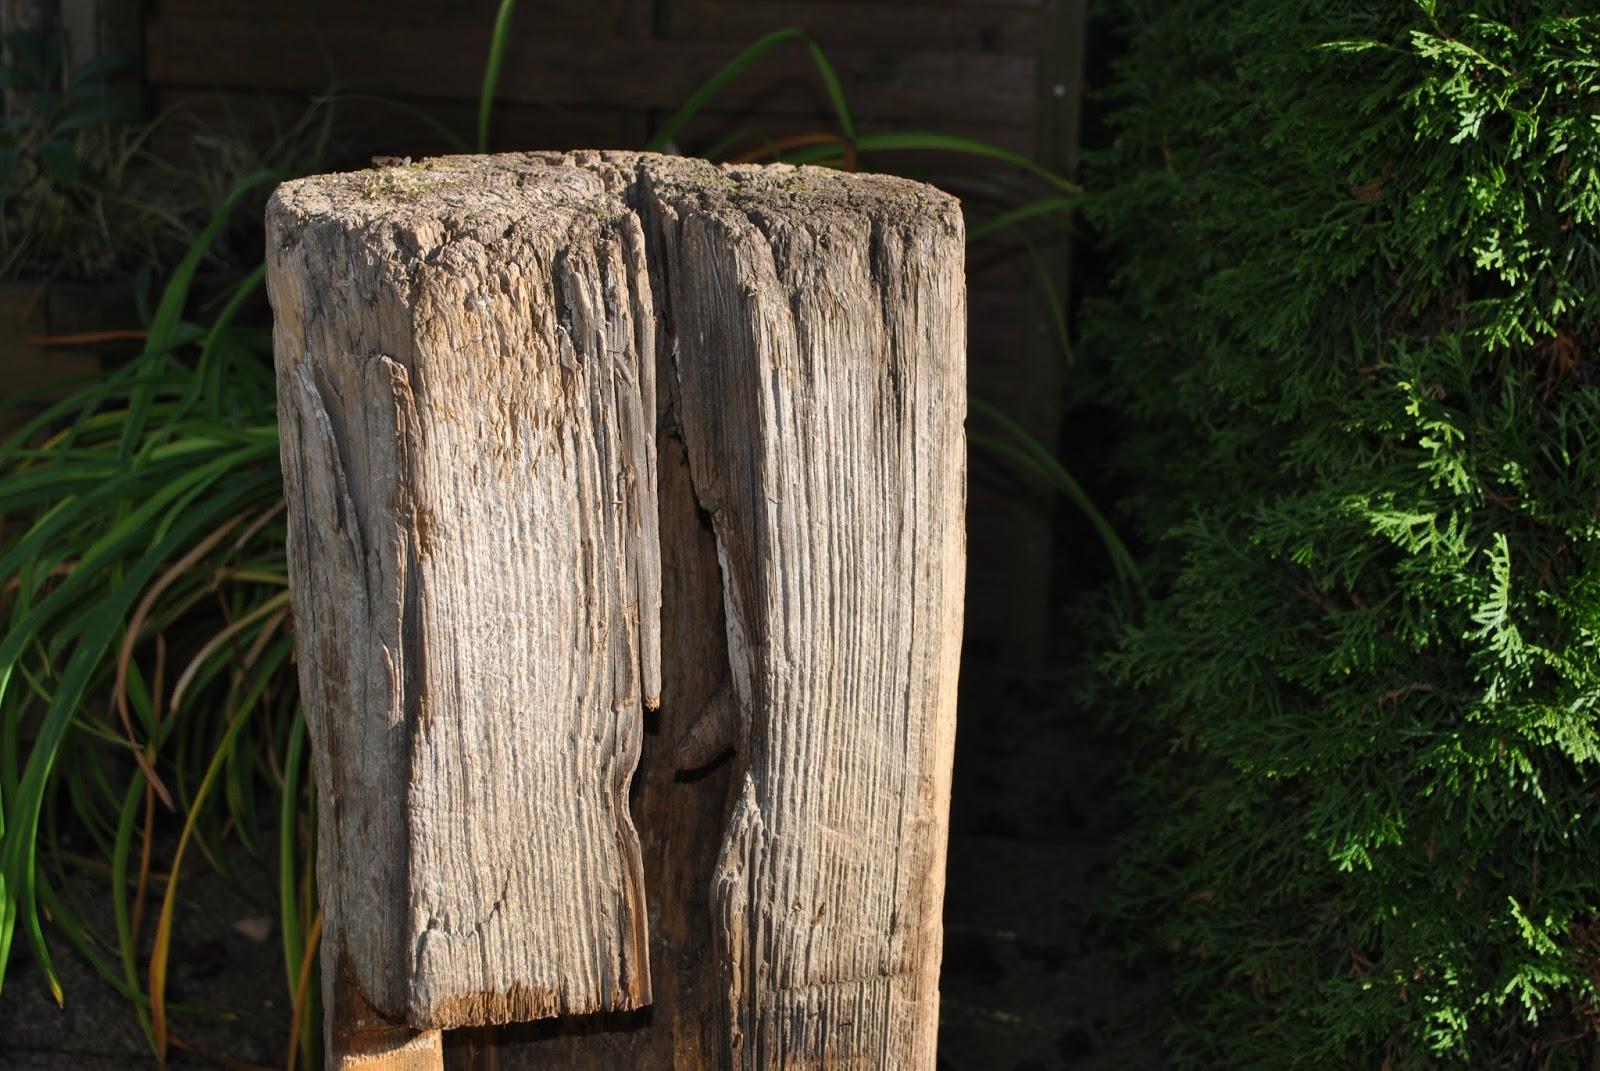 Super Gartendeko-Blog: Alter Pfosten als dekoratives Schmuckstück @GJ_66